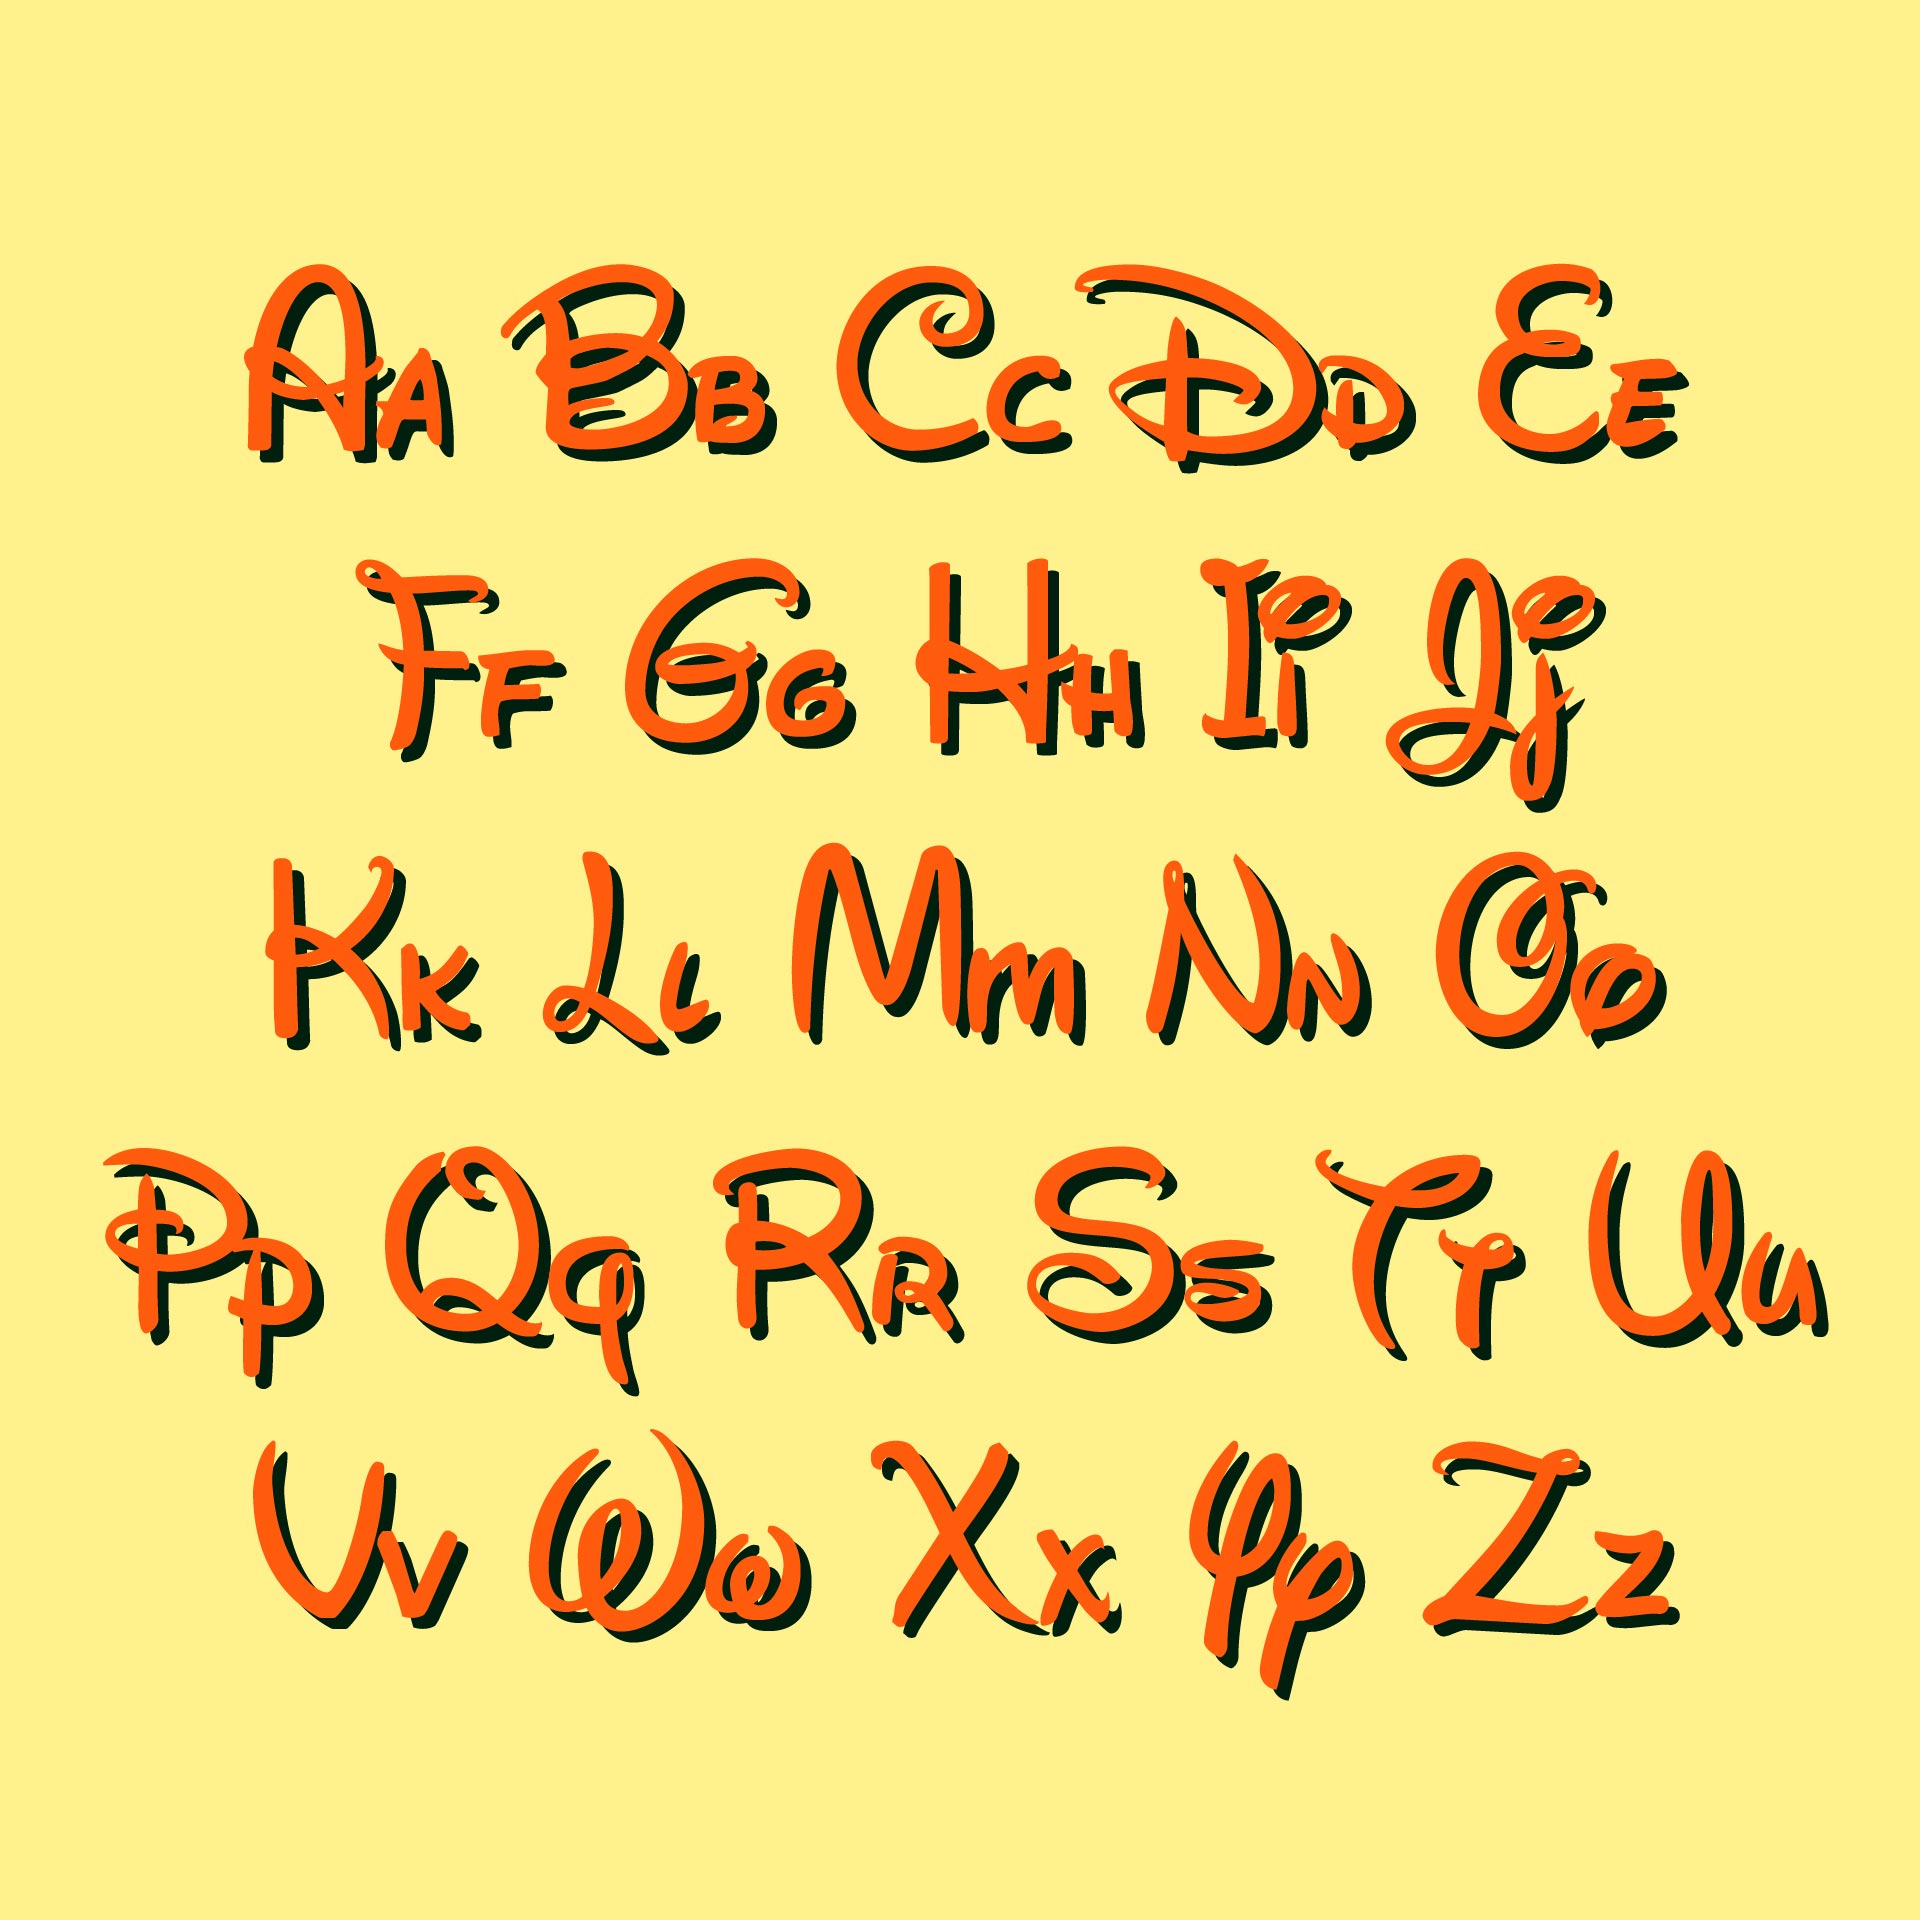 Disney Letters Font Template Printables